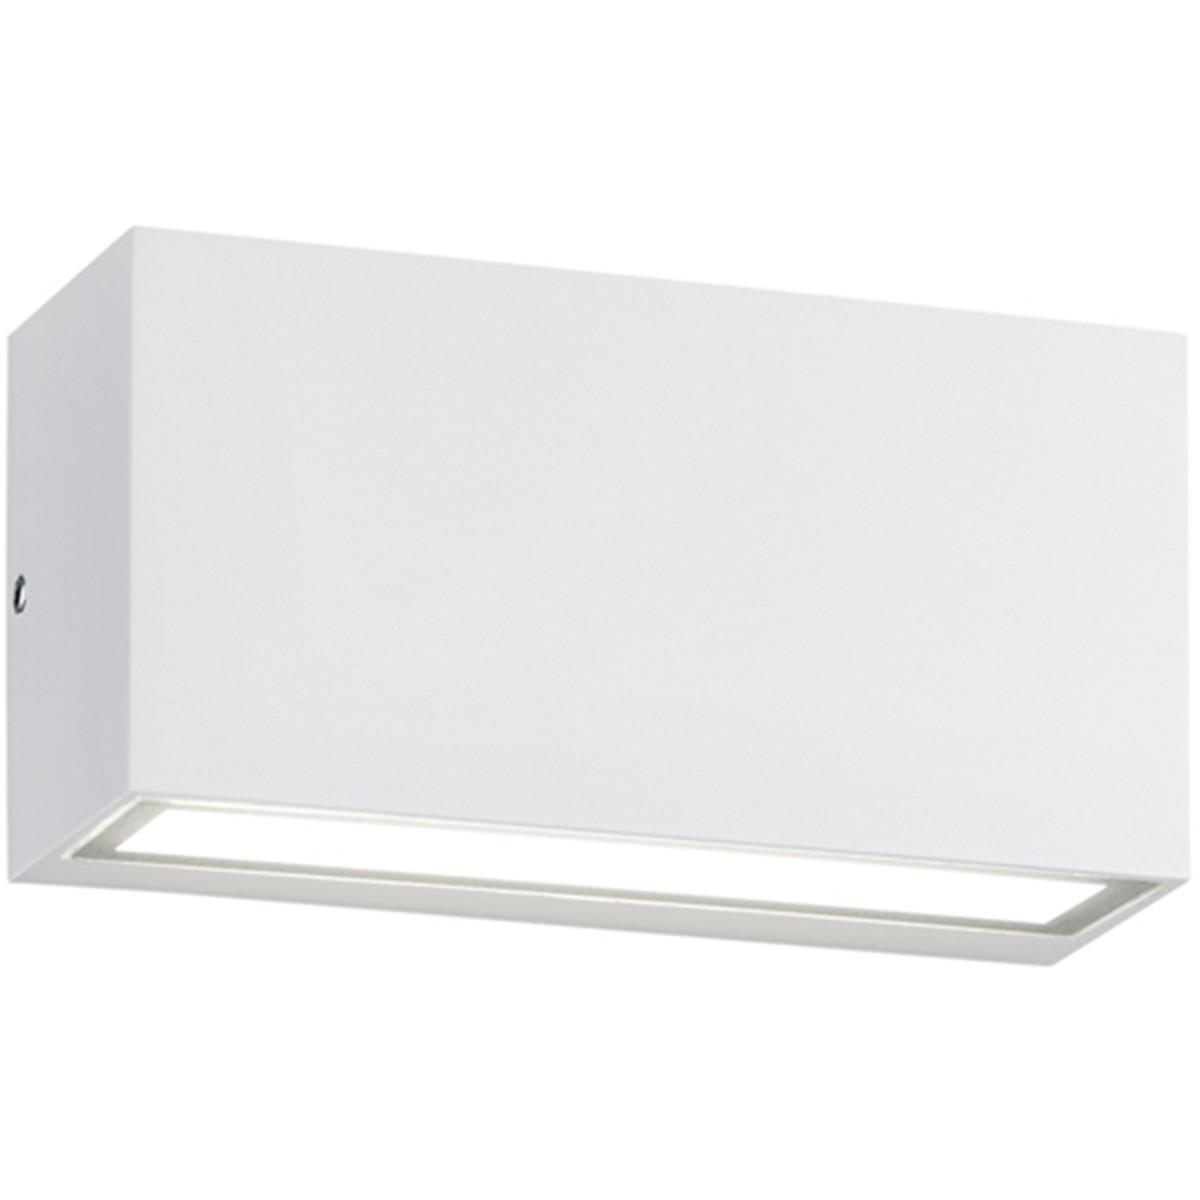 OSRAM - LED Tuinverlichting - Tuinlamp - Trion Tront - Wand - 10W - Mat Wit - Aluminium